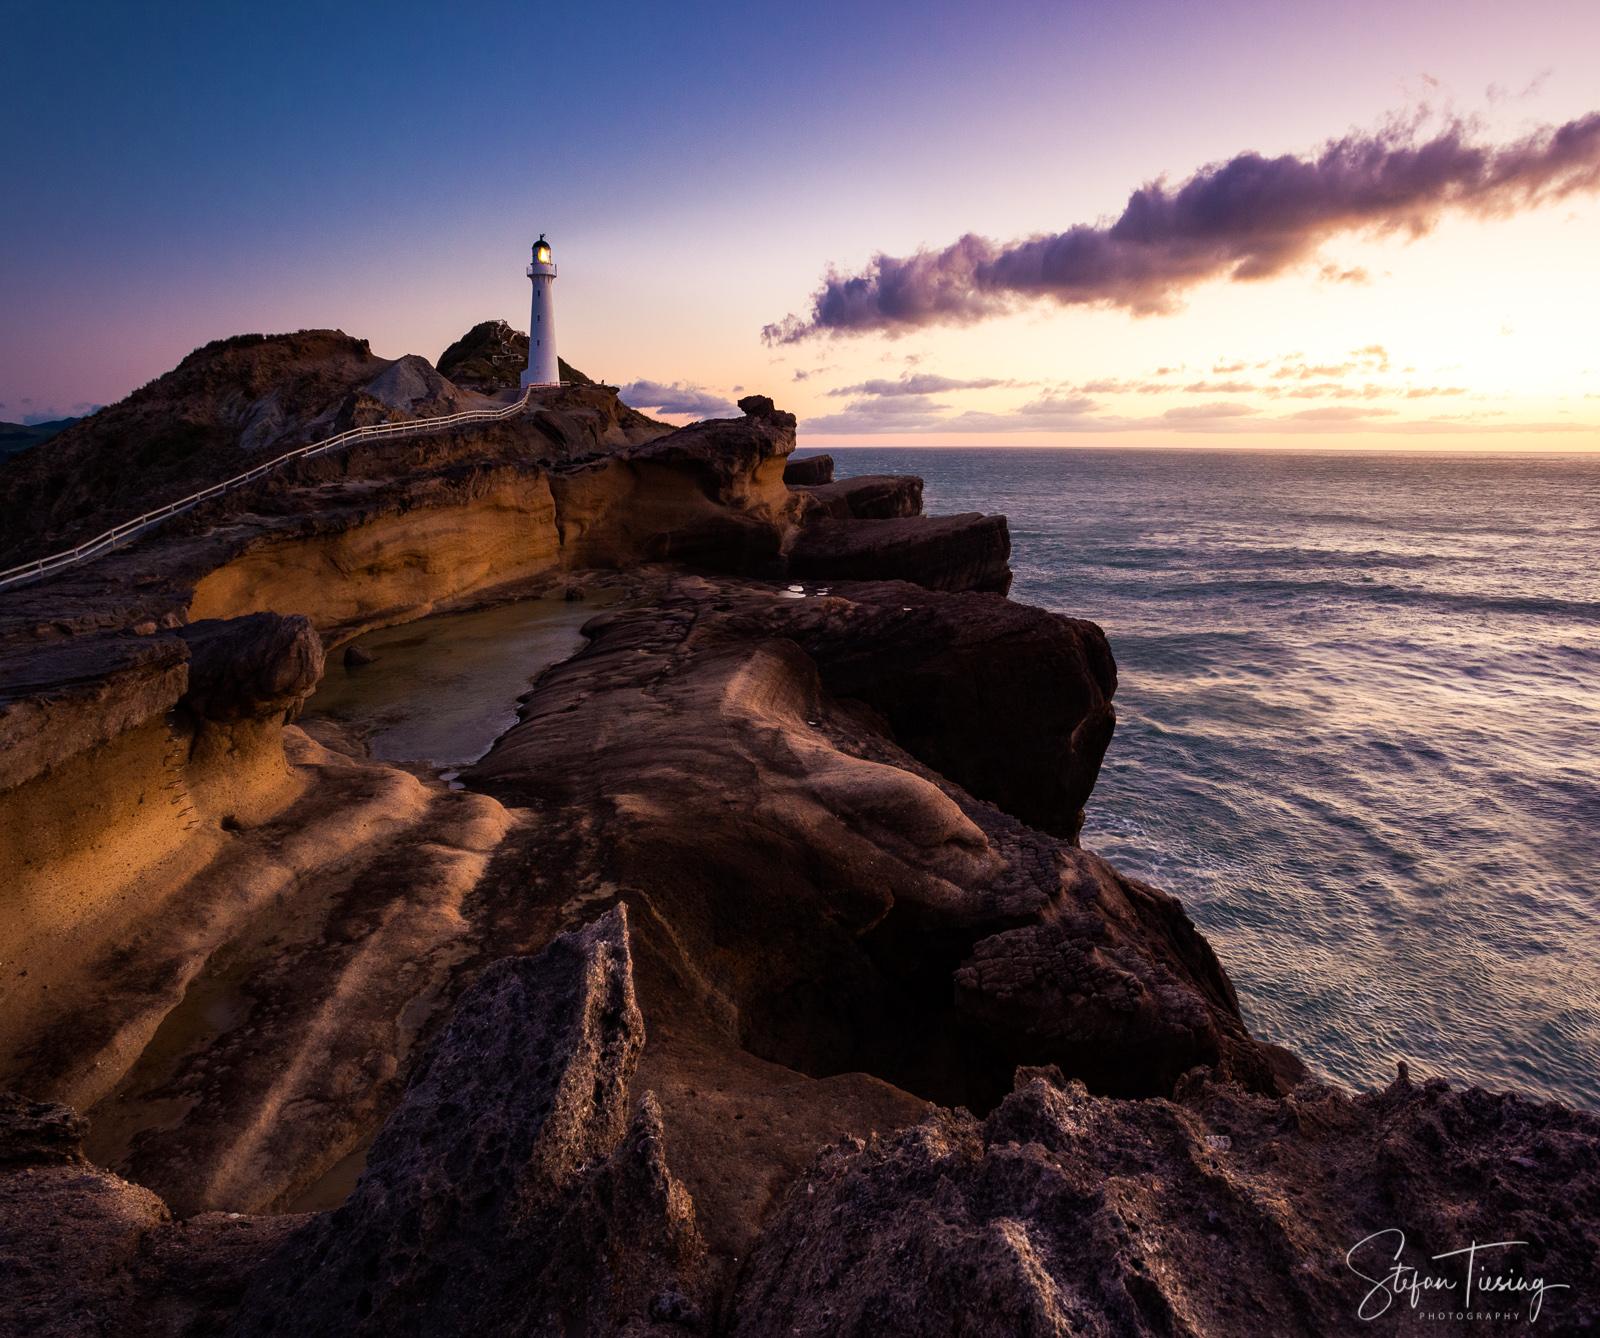 Magic Light at Castlepoint Lighthouse, New Zealand